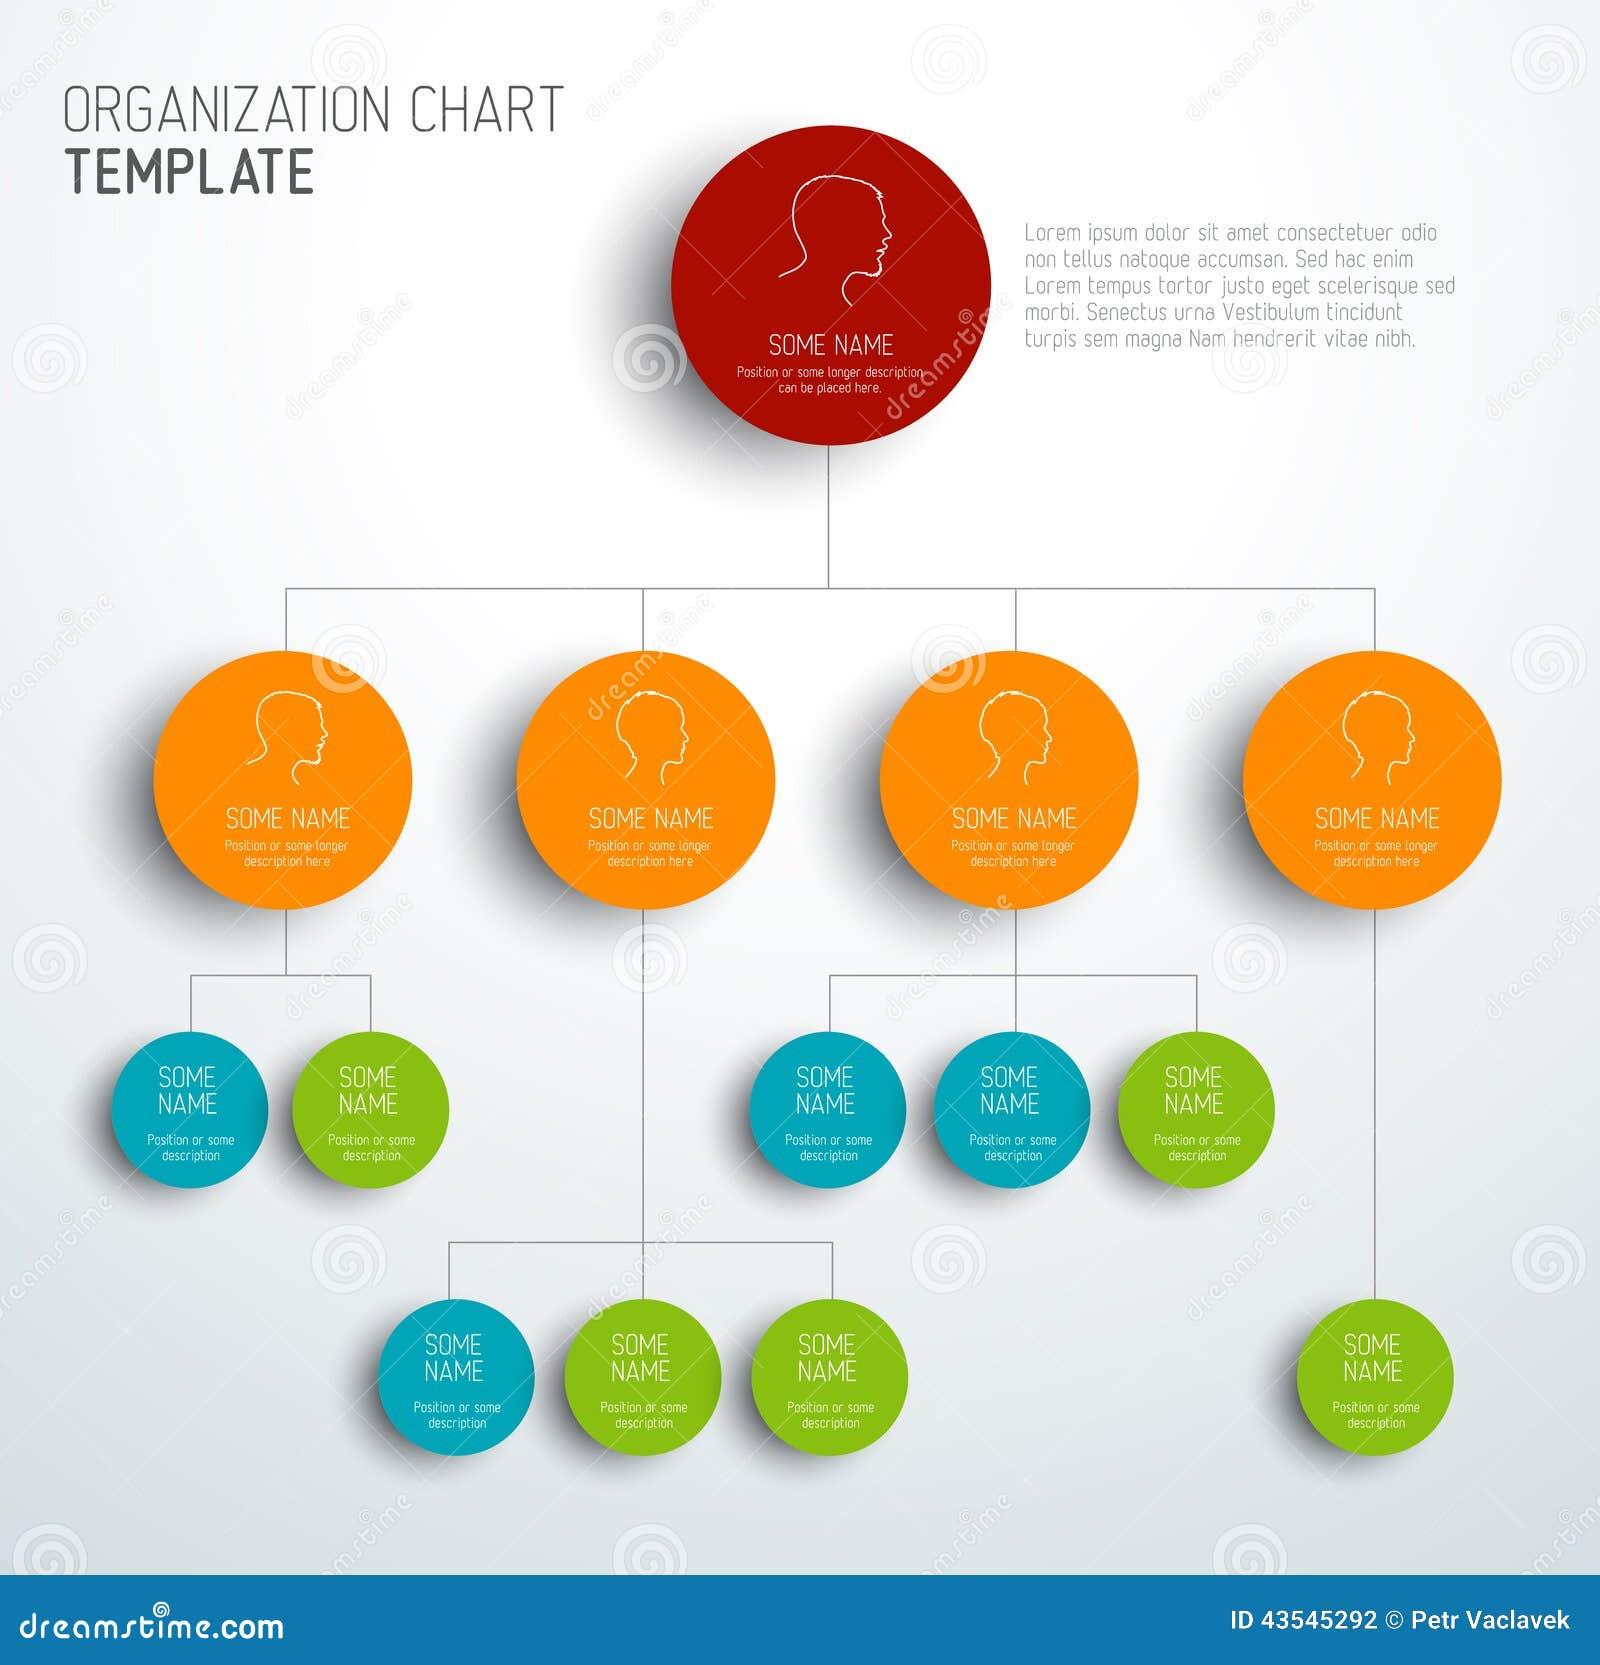 organizational chart free download